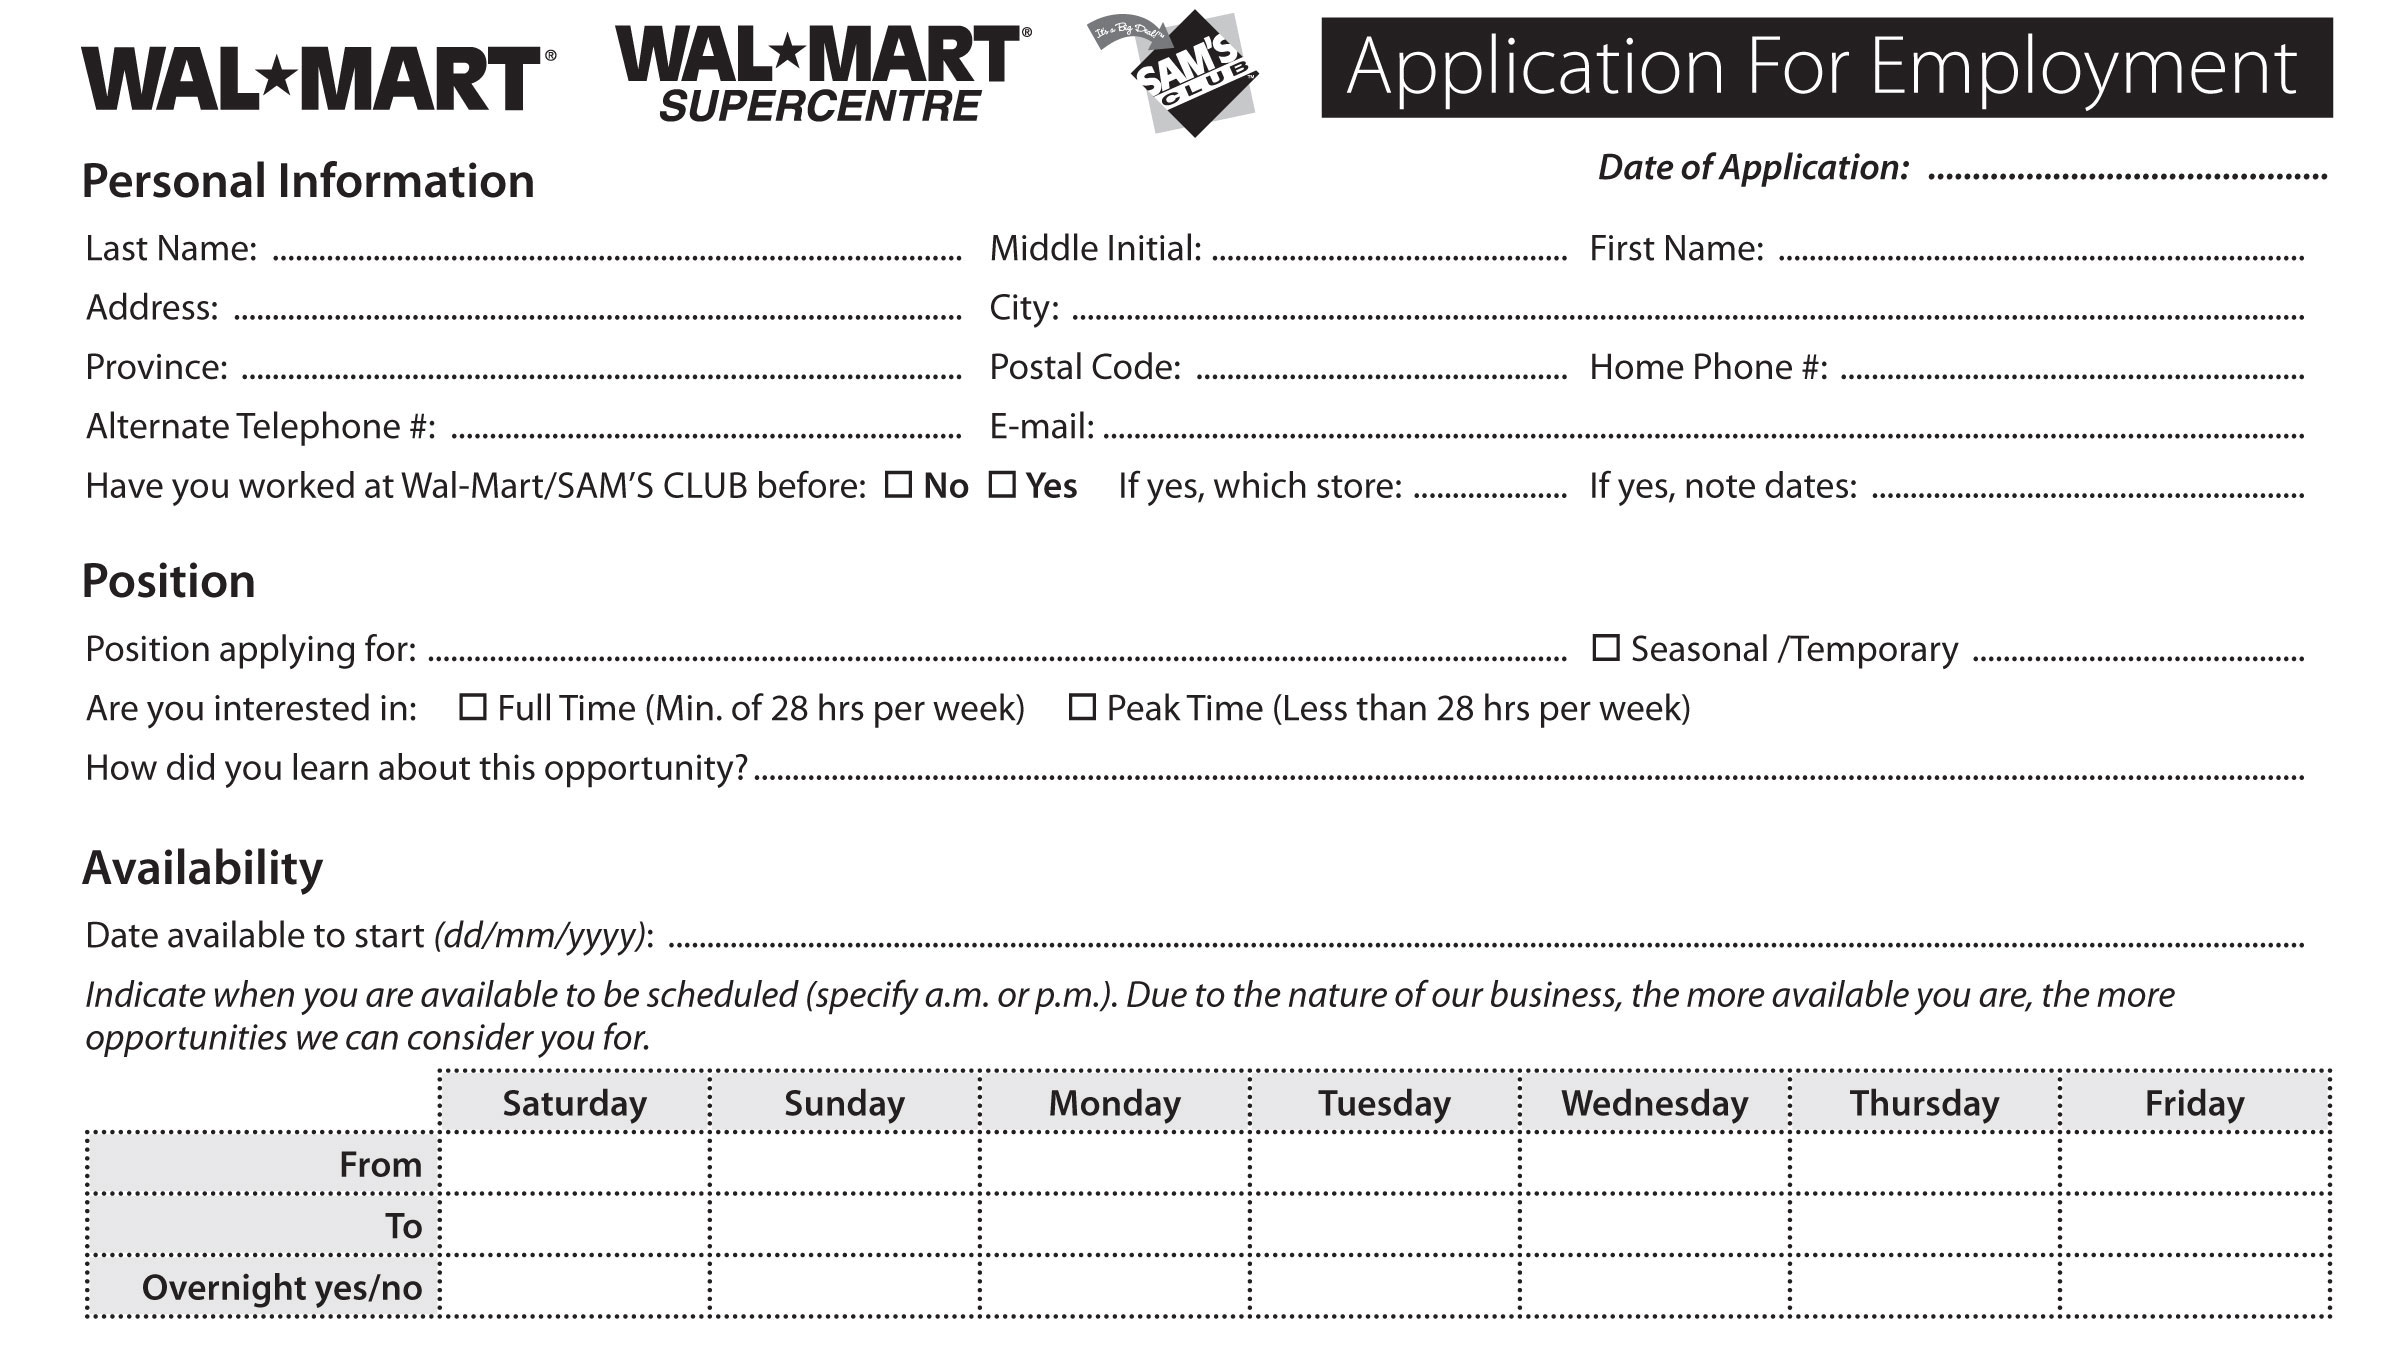 walmart job application sign in resume builder walmart job application sign in print walmart application printable job applications online xvon image walmart careers